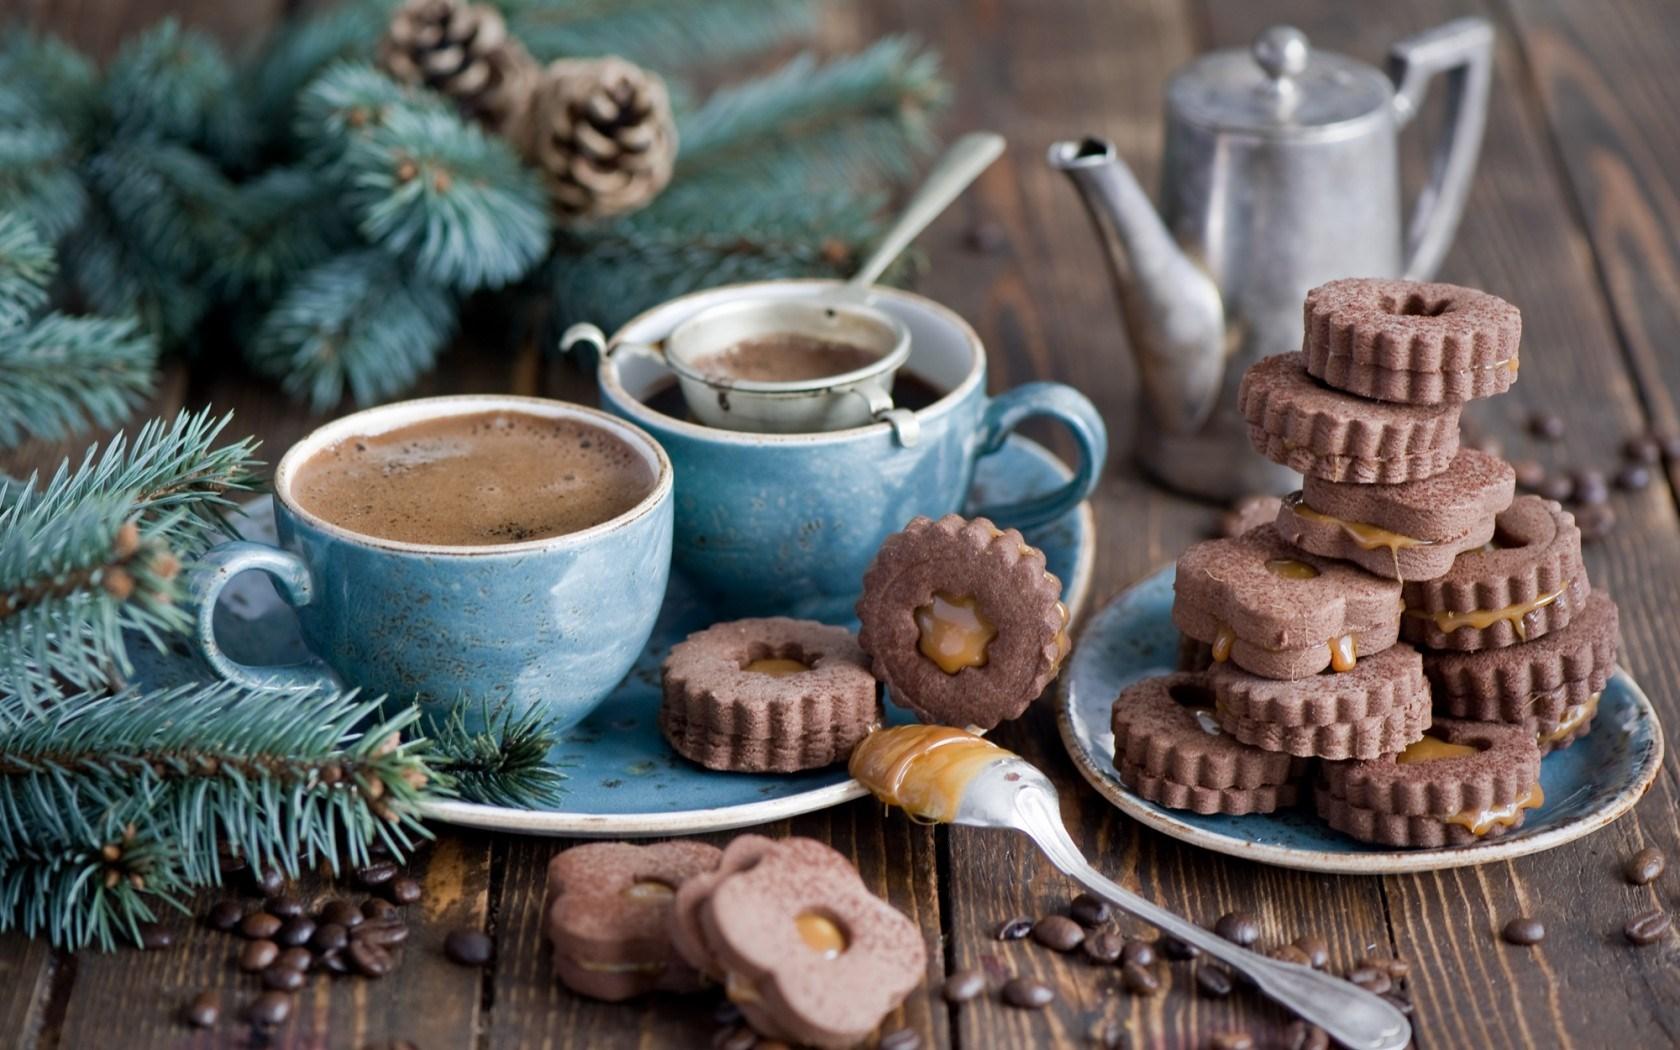 7021820 cookies chocolate dessert coffee cups branch spruce pine cones winter 1